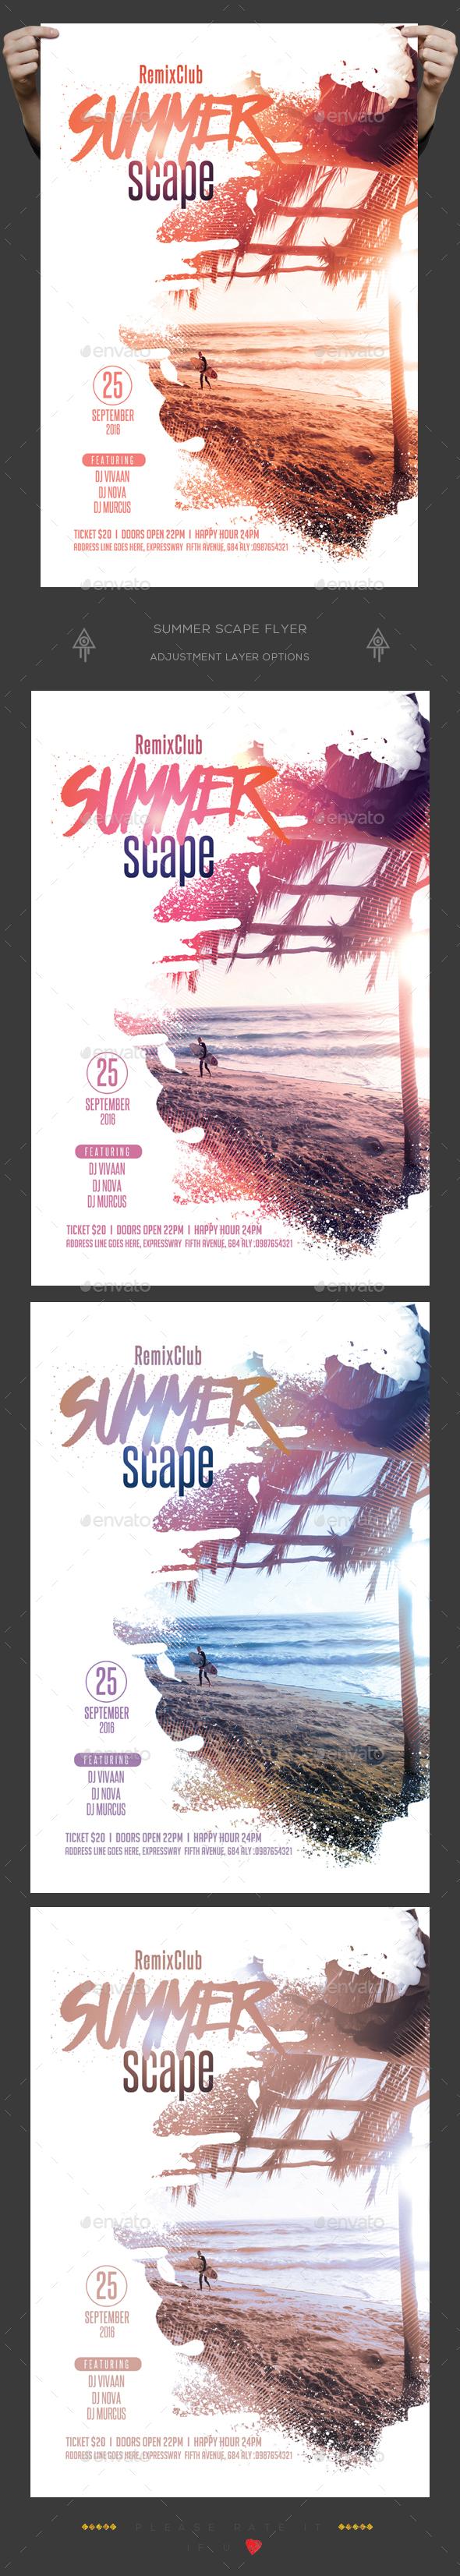 Summer Scape Flyer